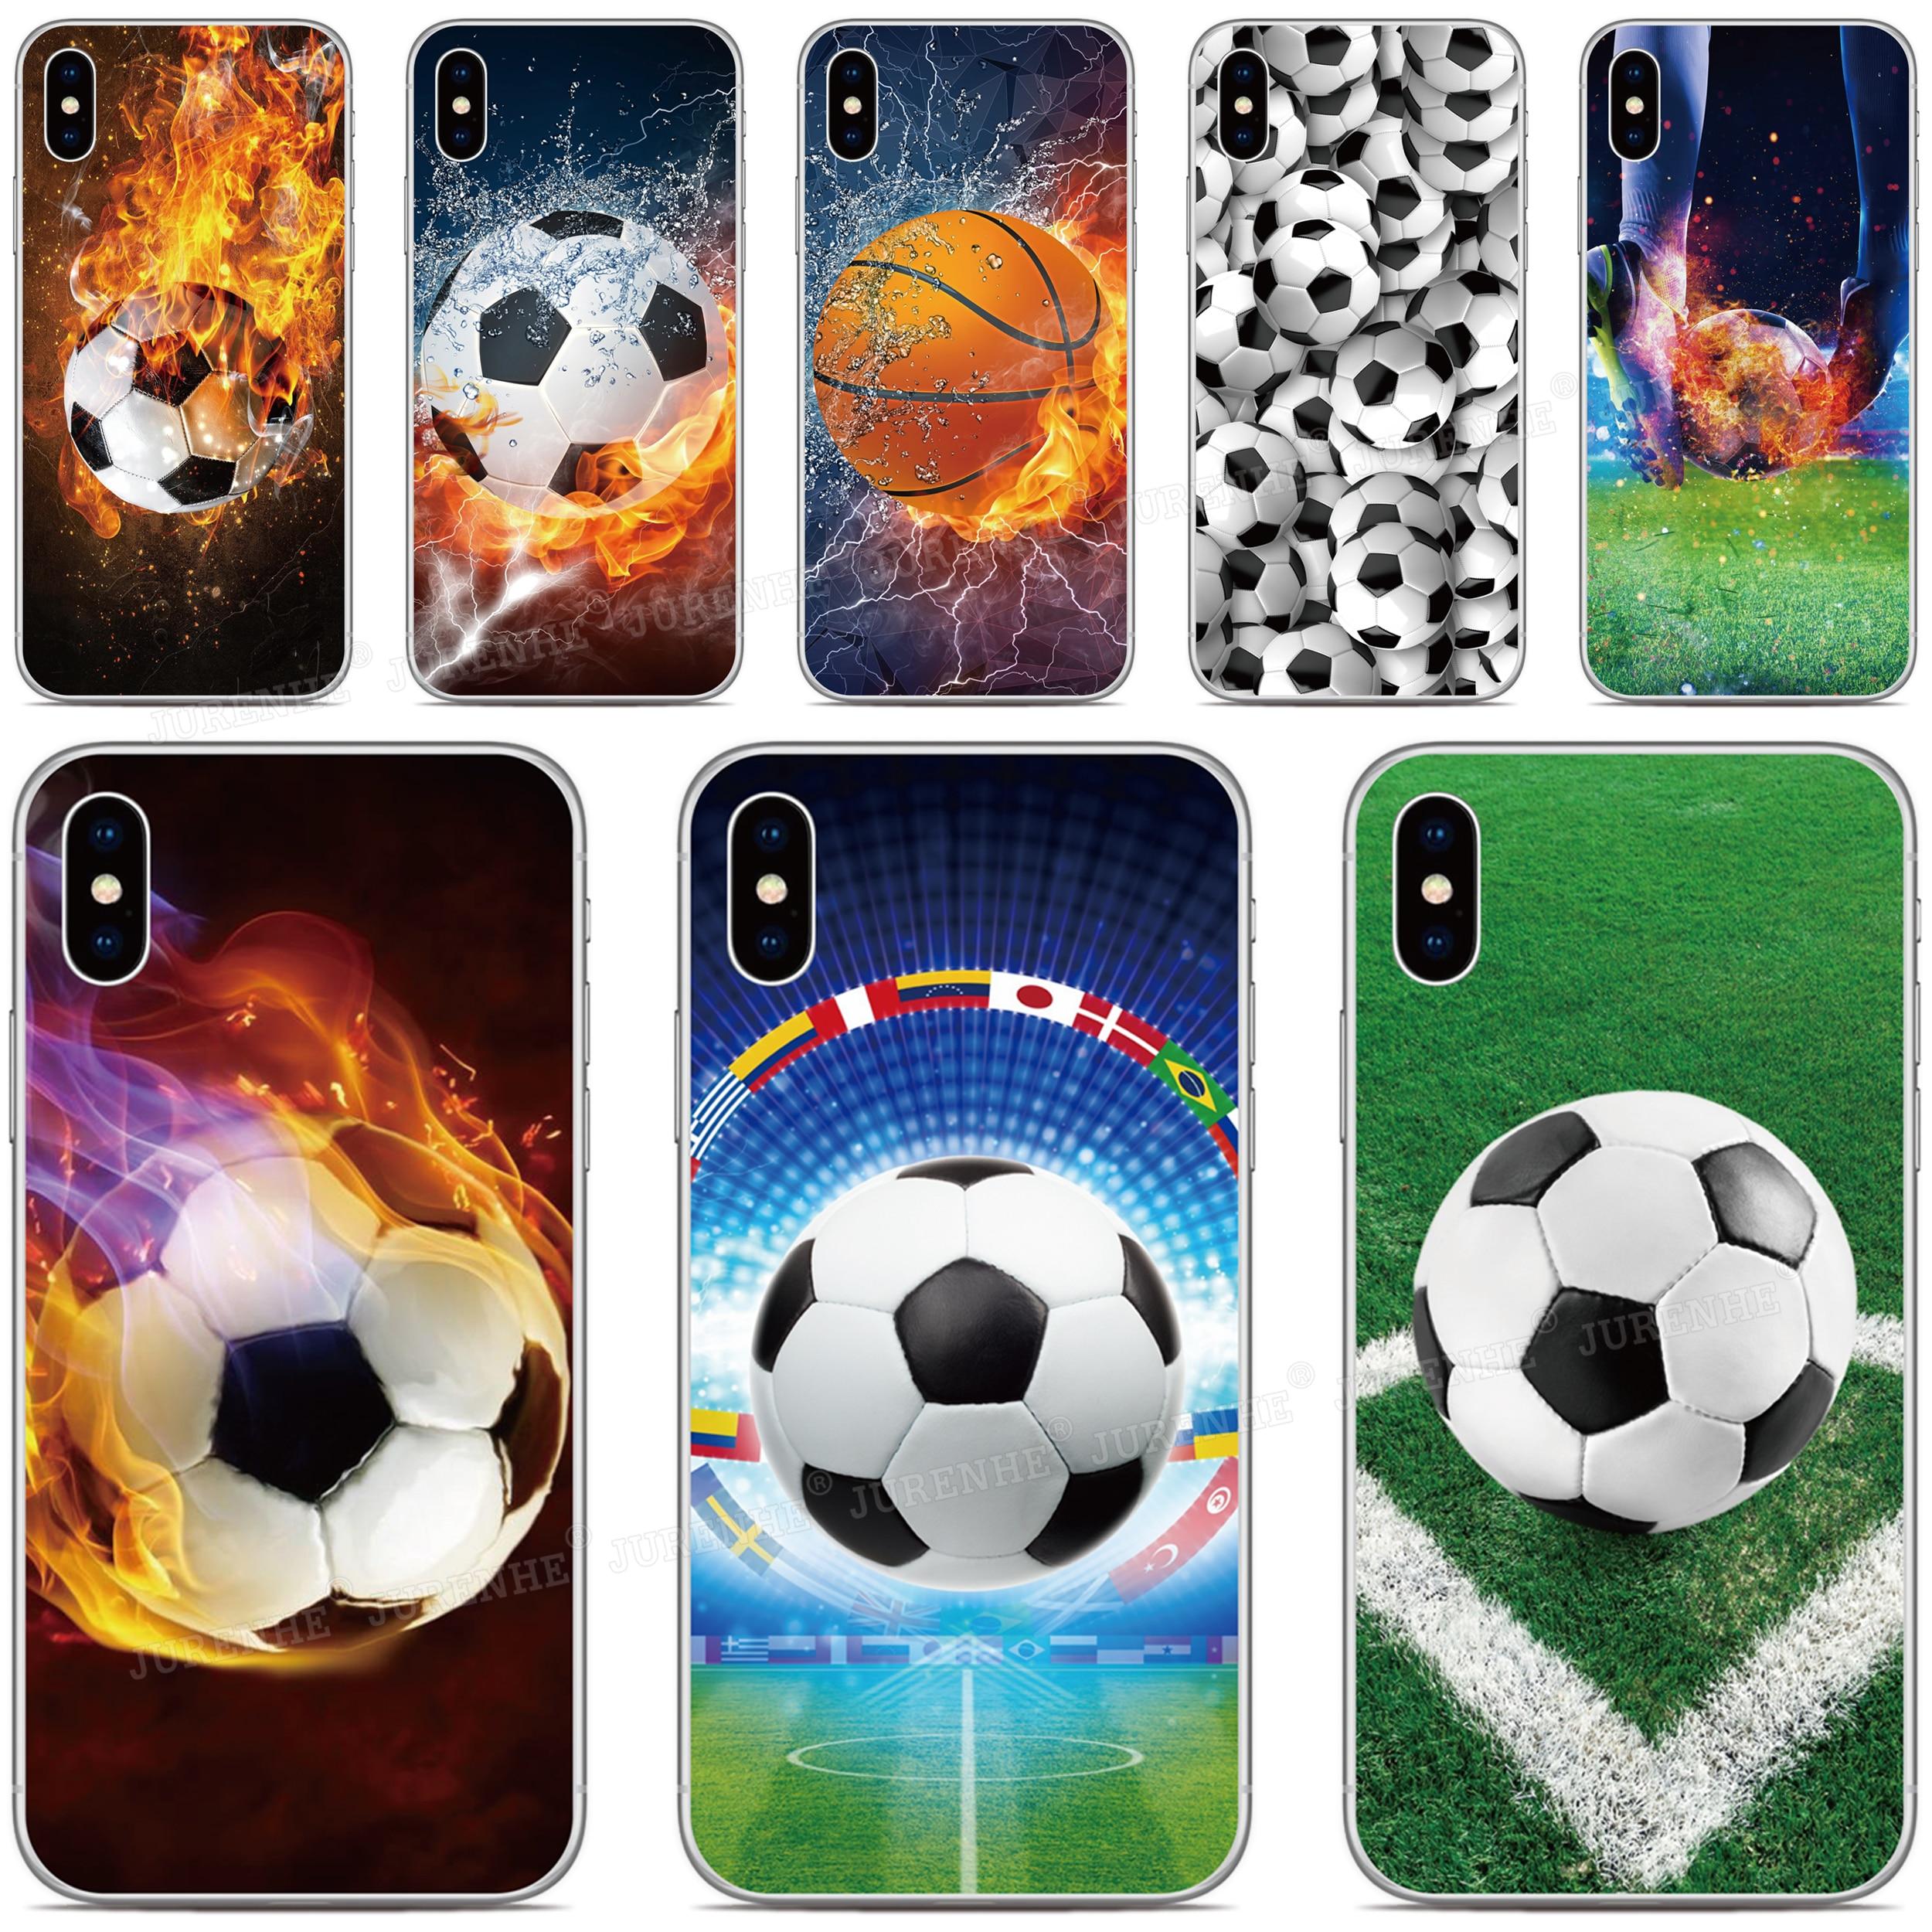 Capa de futebol para blackberry keyone chave 2 priv motion passport q30 z10 z30 q10 dtek50 dtek60 dtek70 caso de telefone